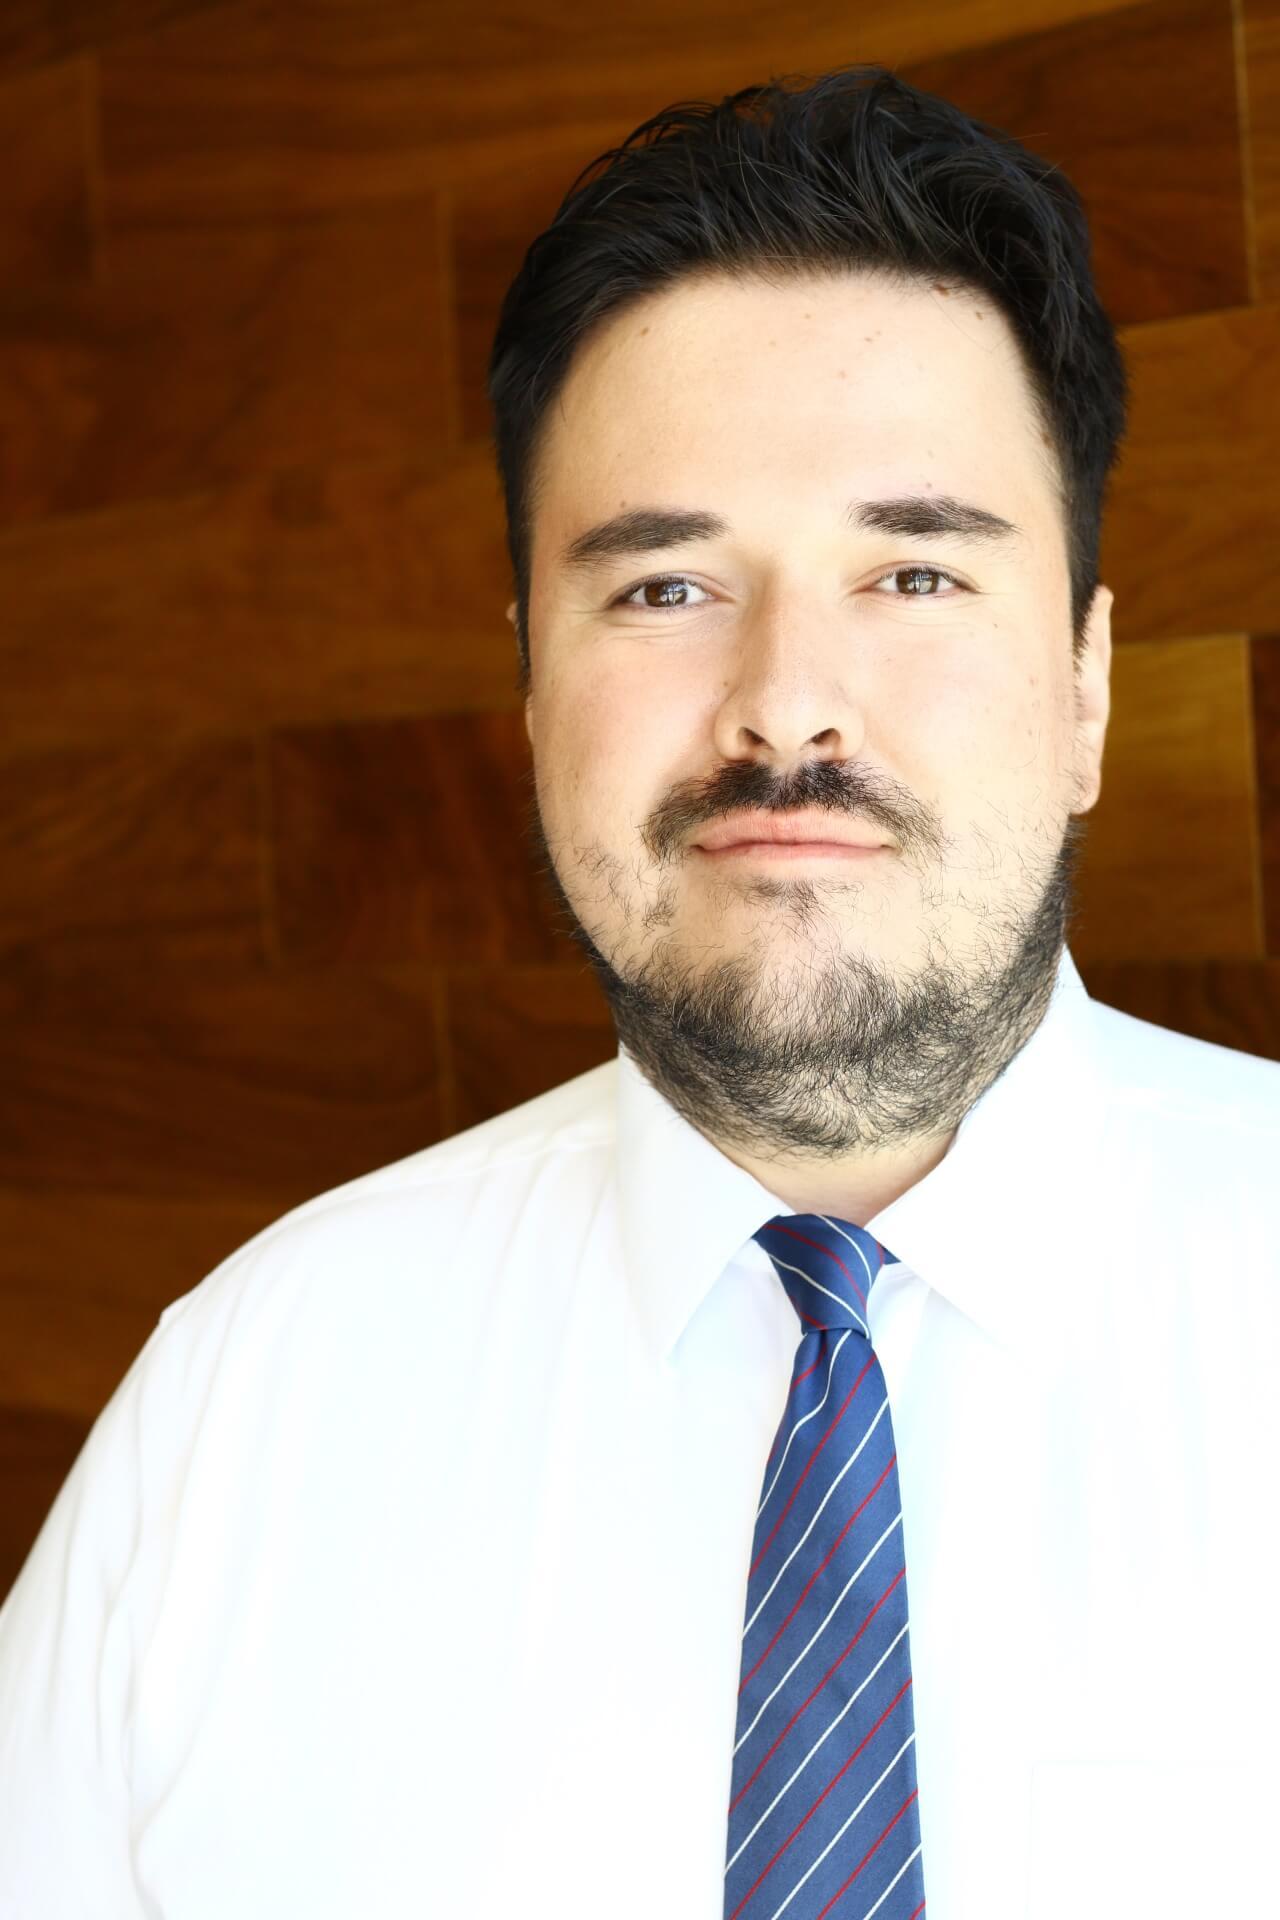 Santiago Baez